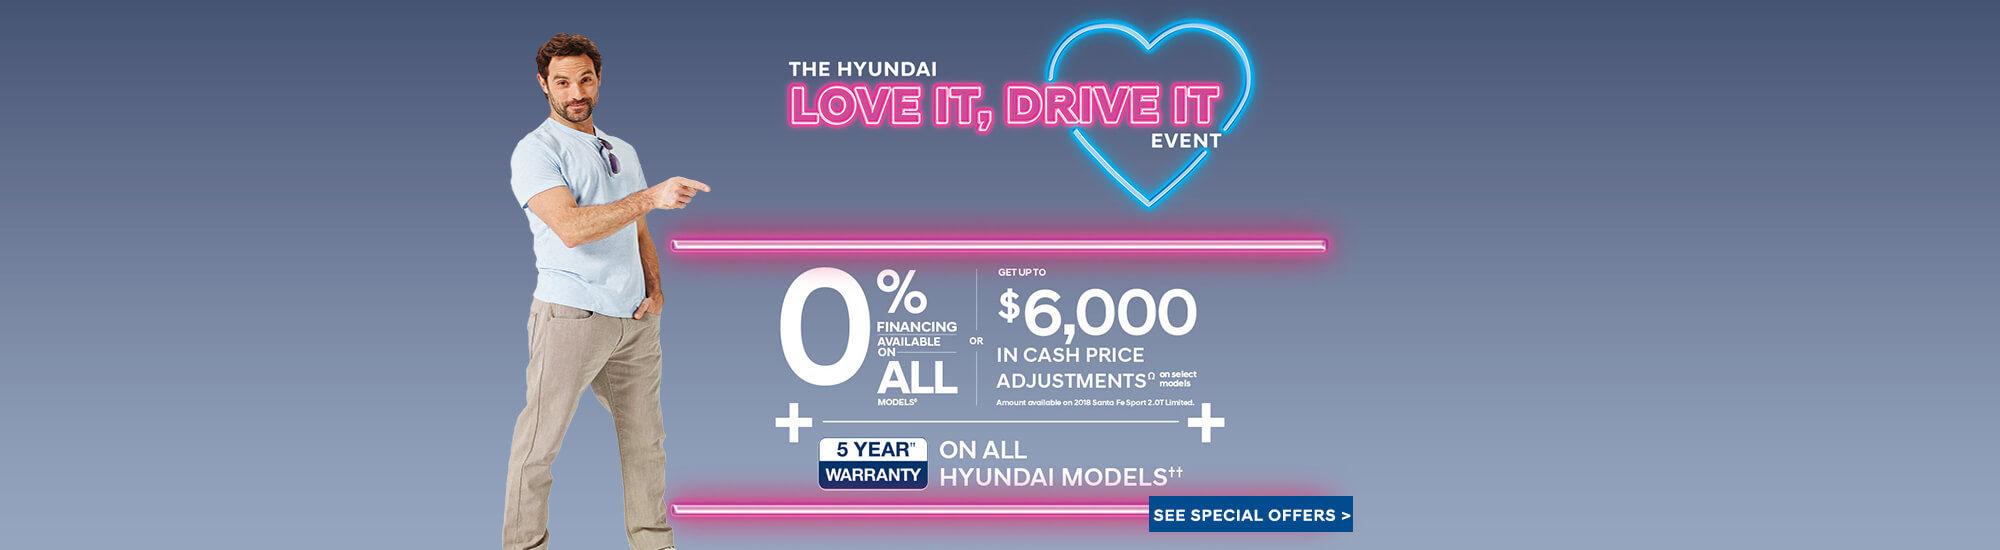 The Hyundai love it, drive it event